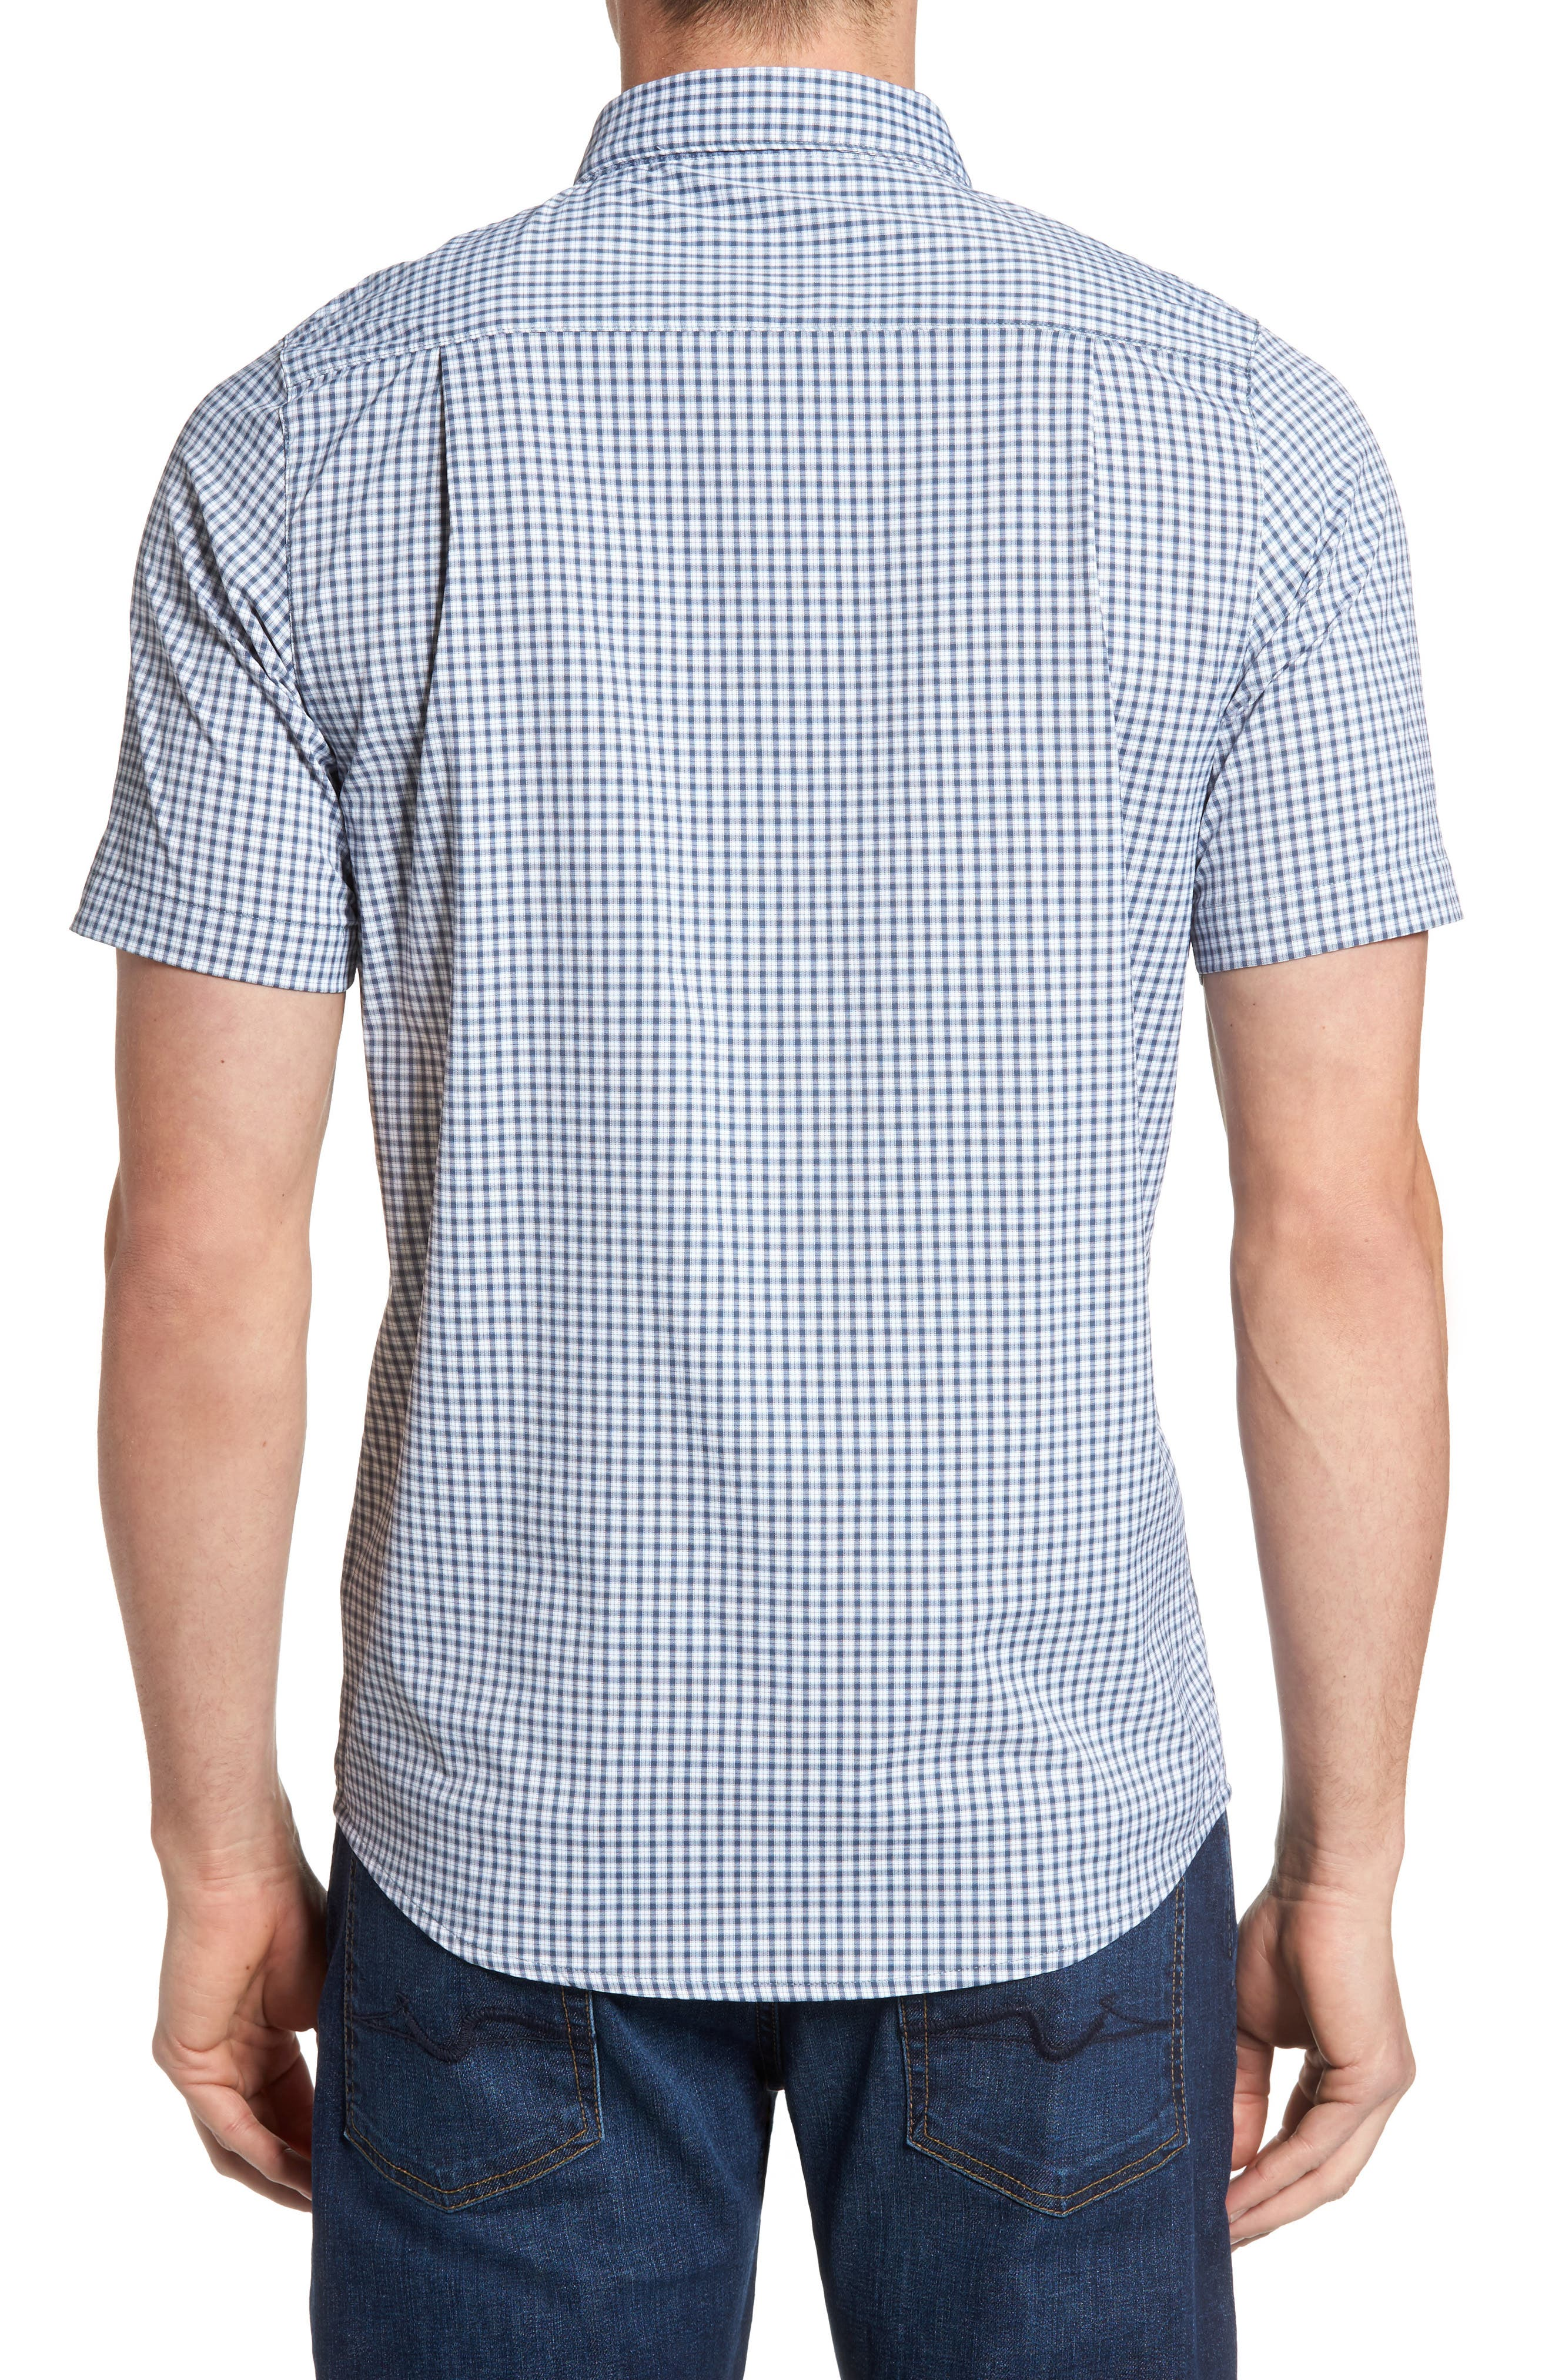 Alternate Image 2  - Travis Mathew Barker Trim Fit Plaid Sport Shirt